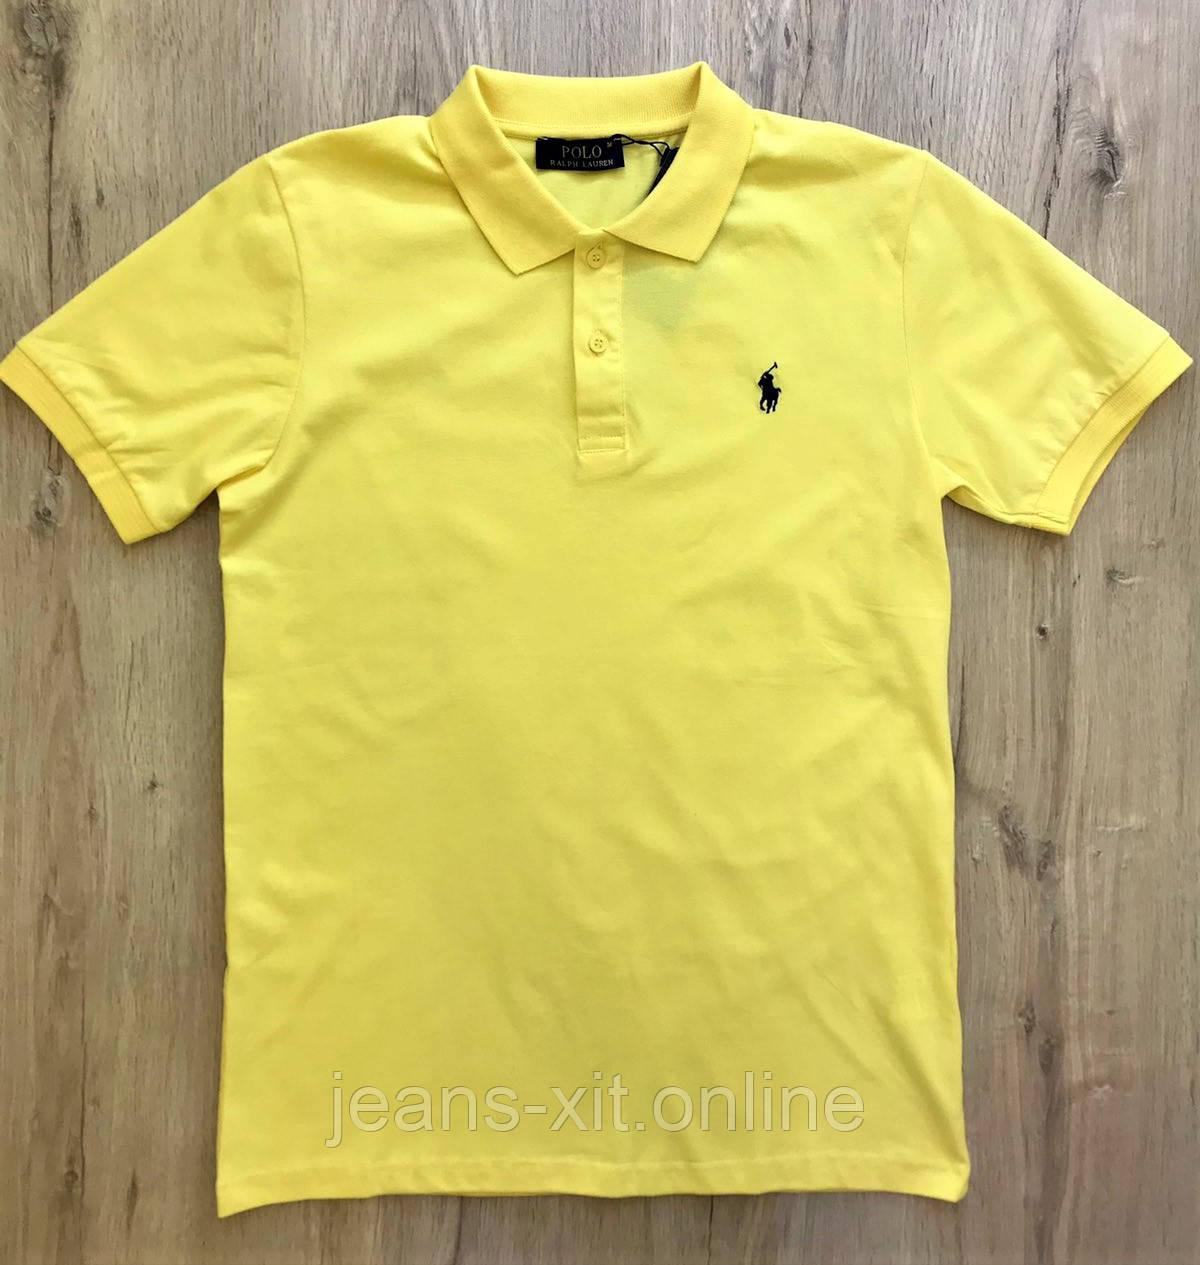 Футболка Чол. M(р) жовтий 1444-20 Polo Туреччина Літо-C